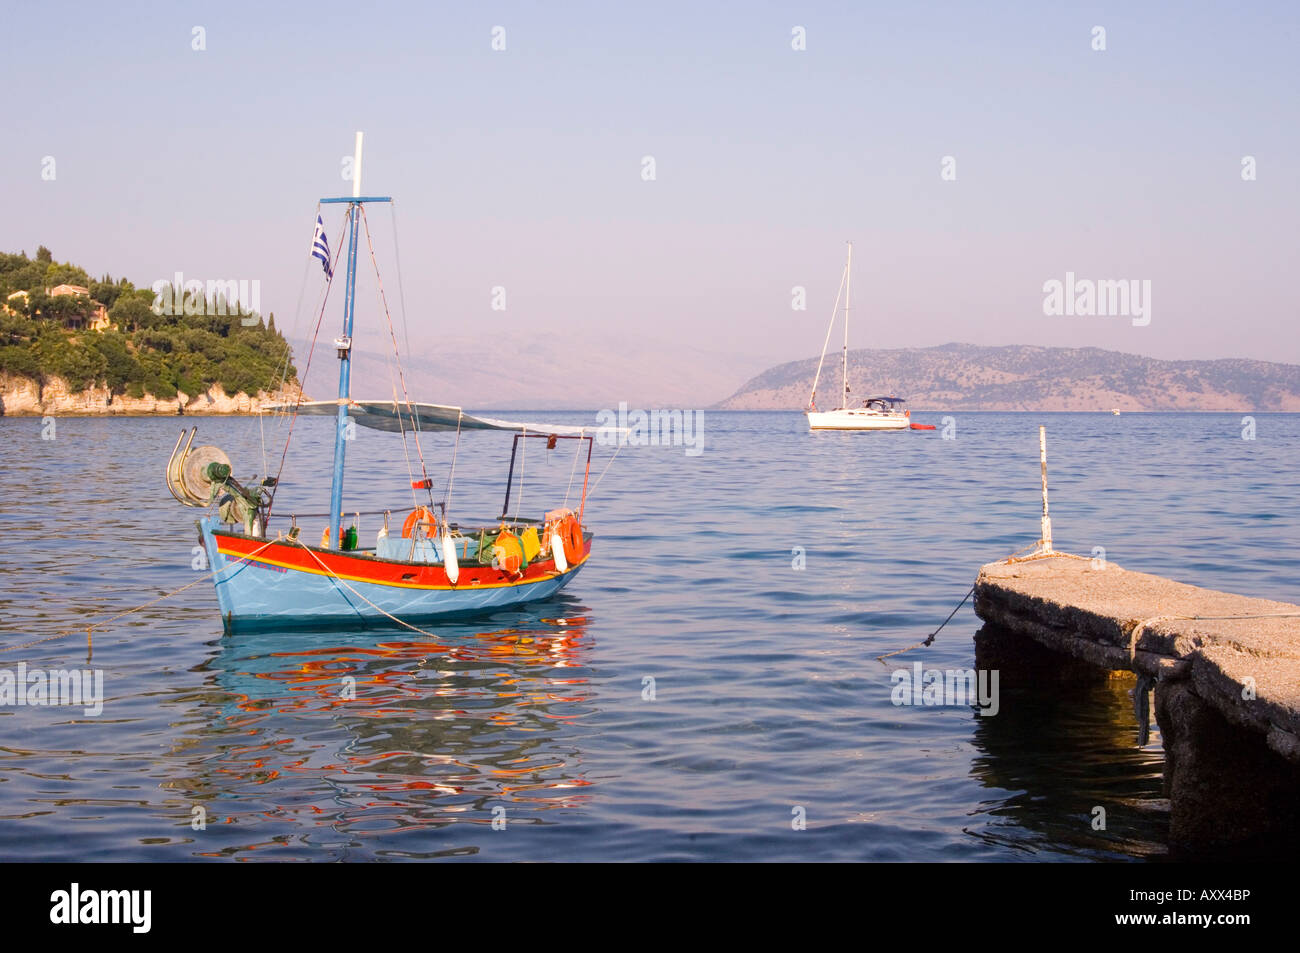 Colourful old wooden fishing boat in Kalami on the northeast coast, Corfu, Ionian Islands, Greek Islands, Greece, - Stock Image